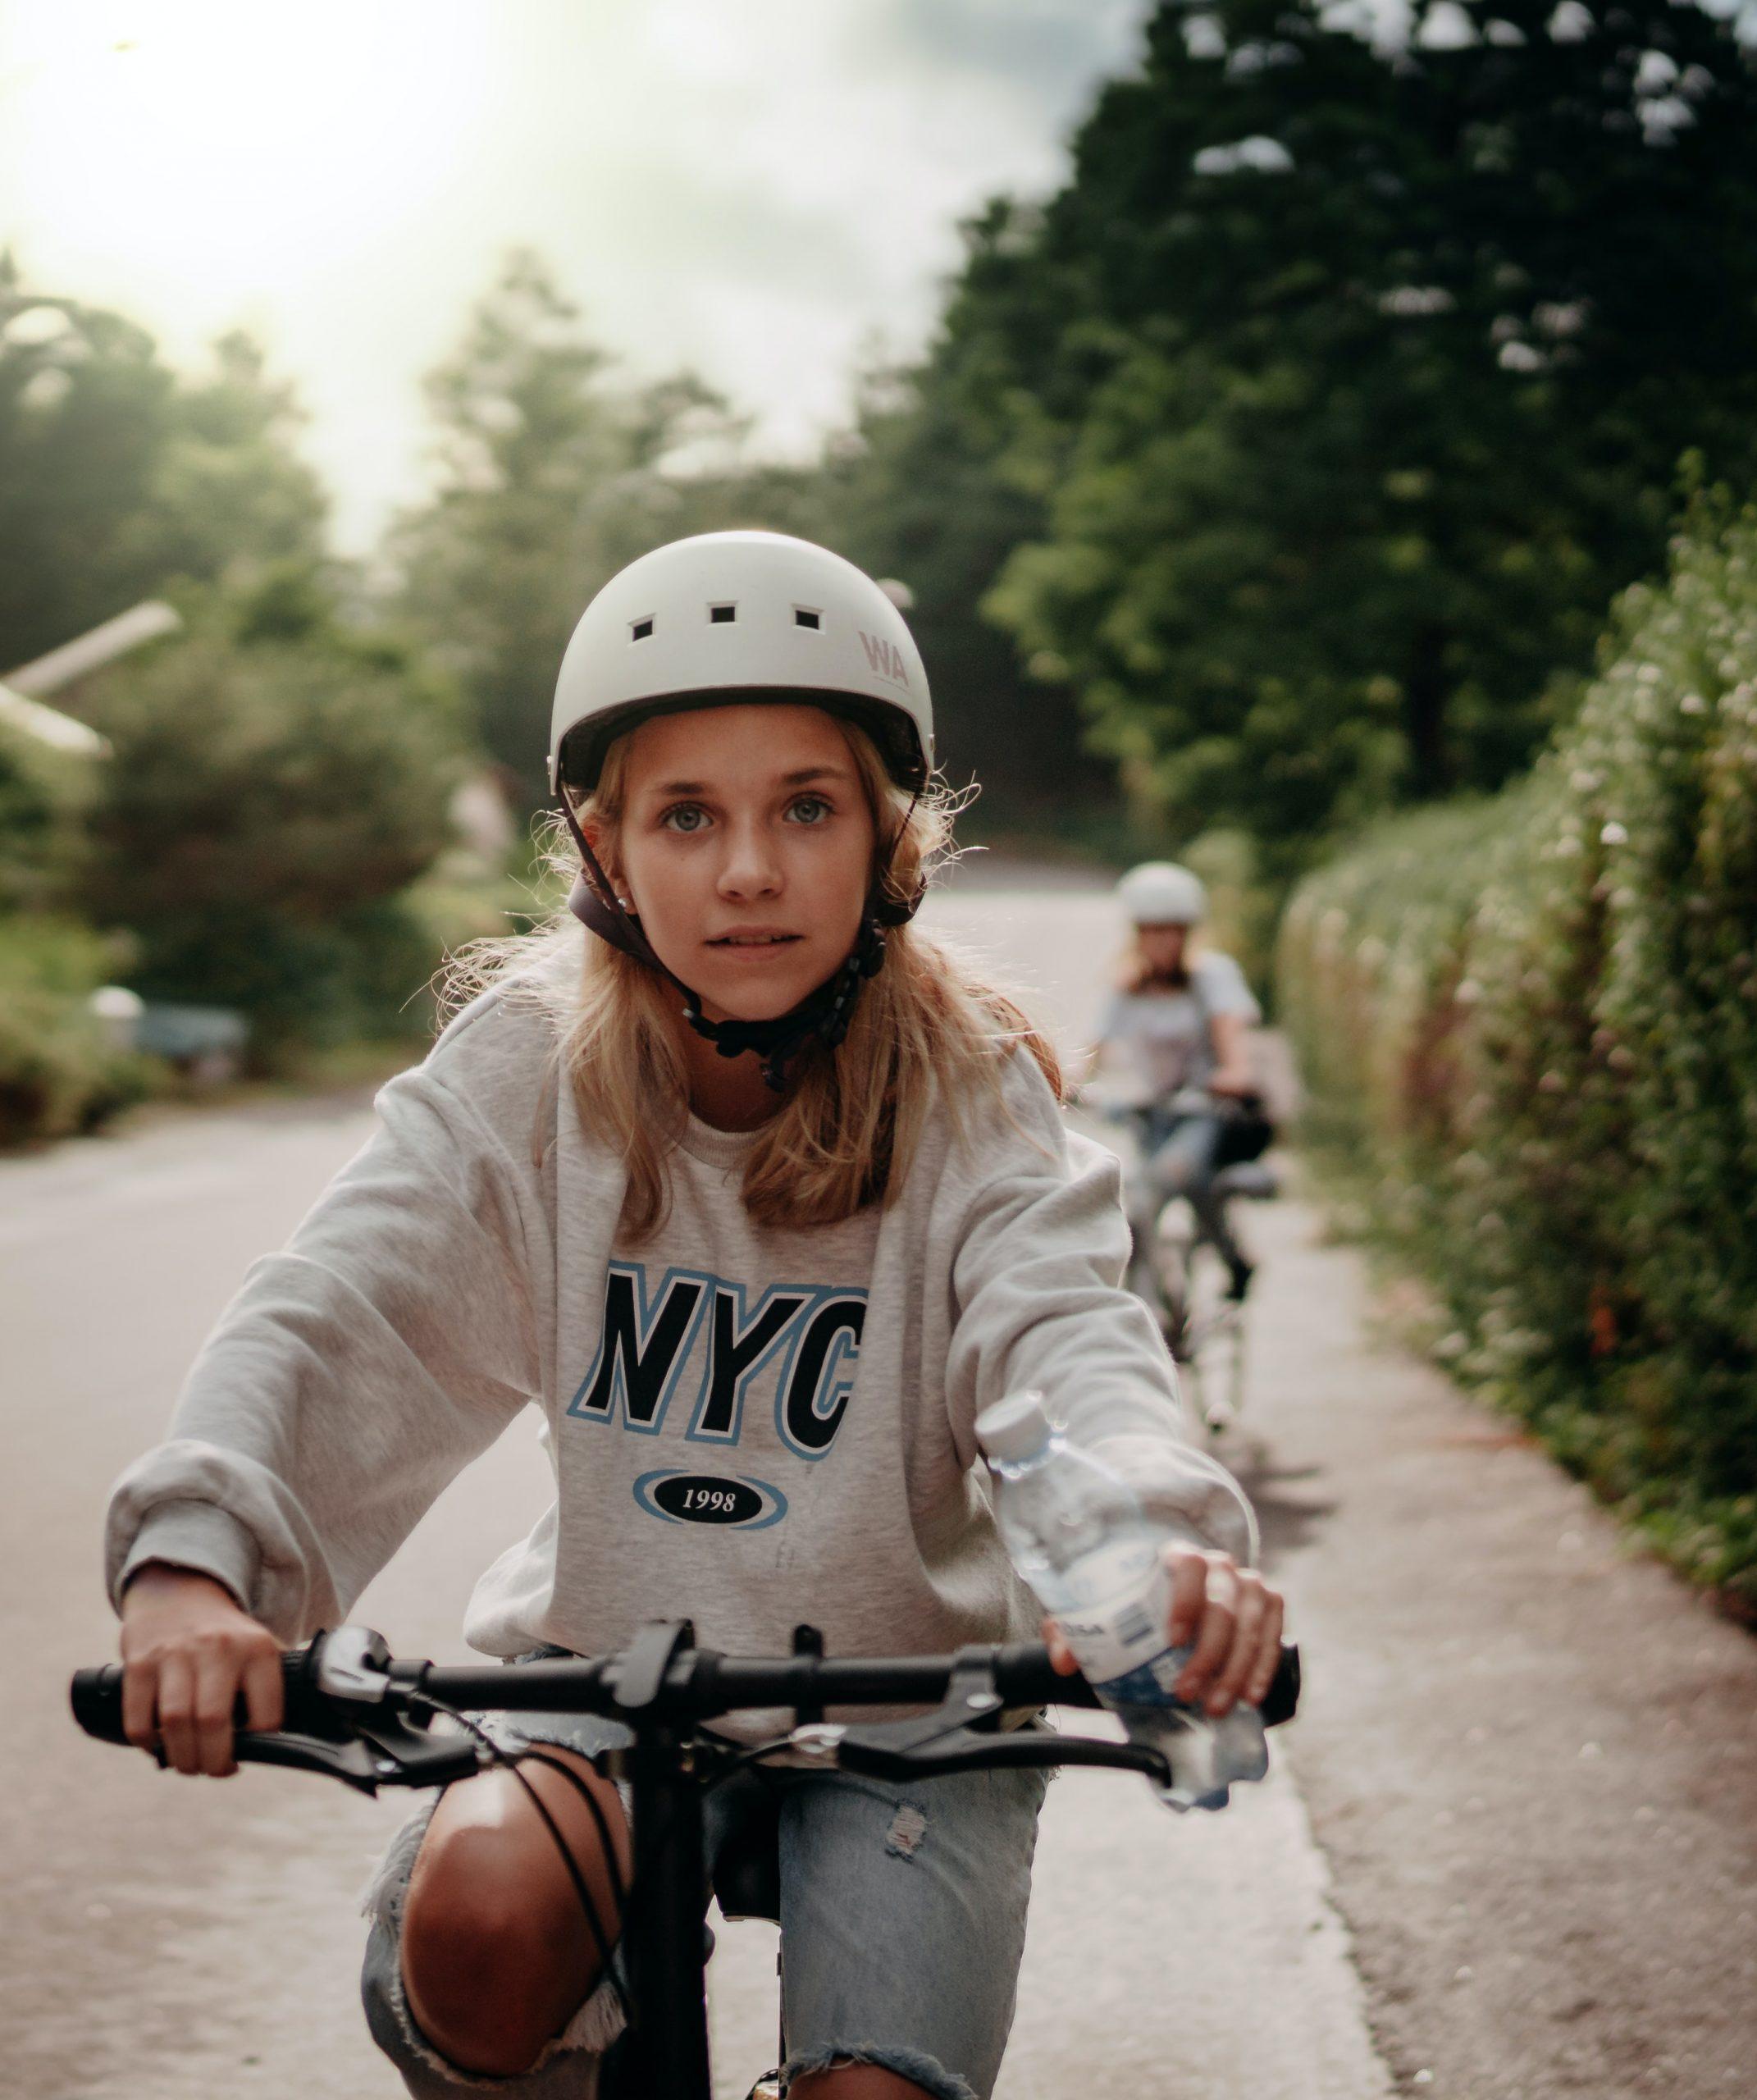 girl biking with a helmet on